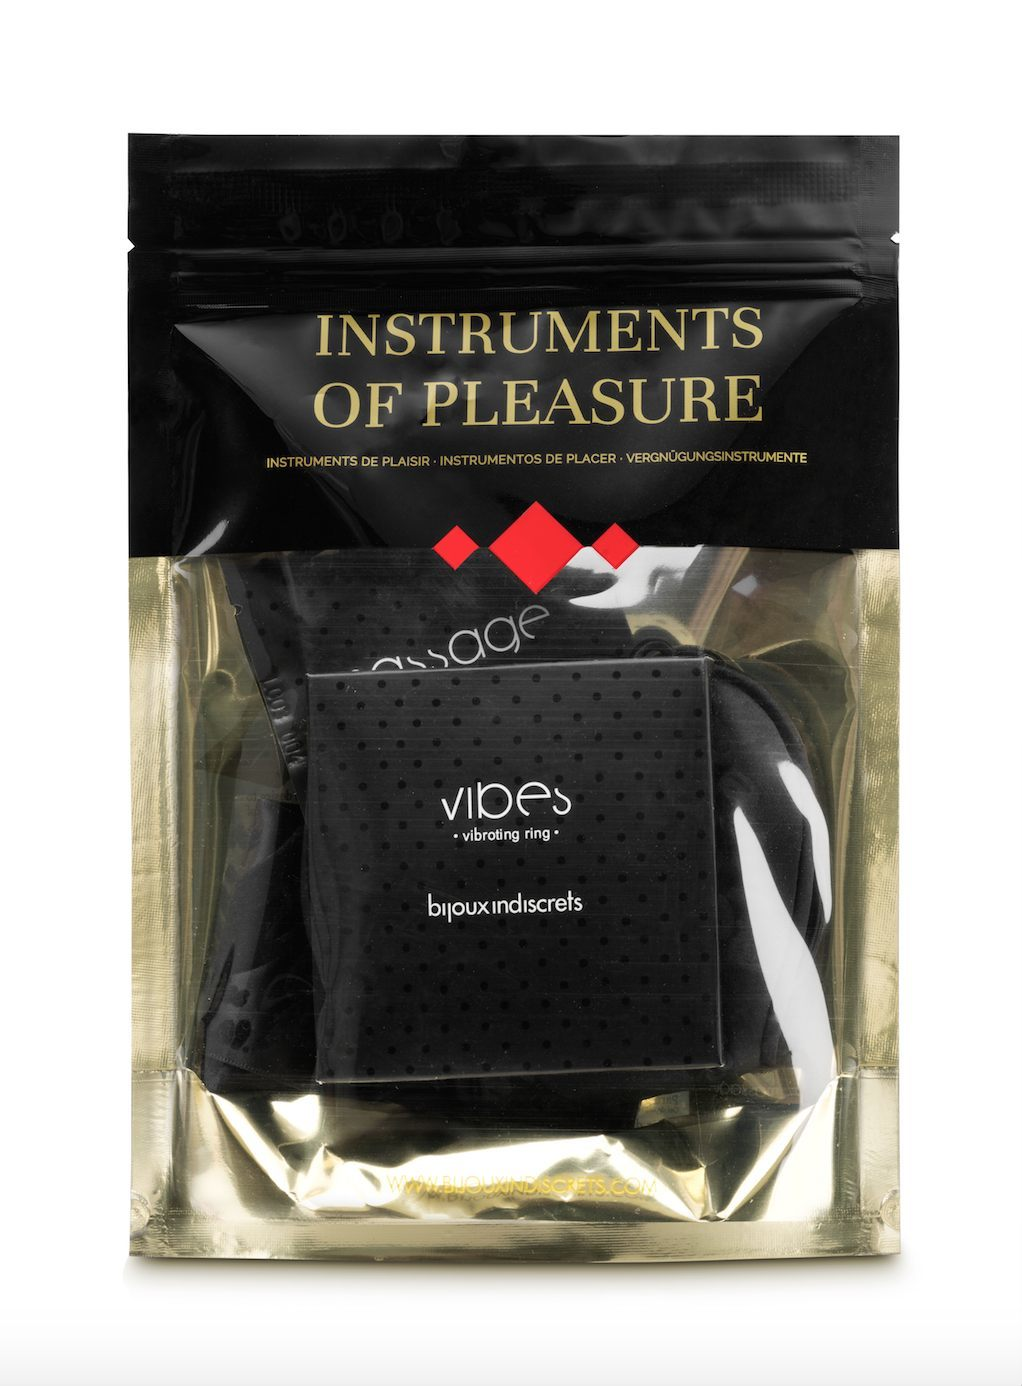 Instruments of pleasure – RED